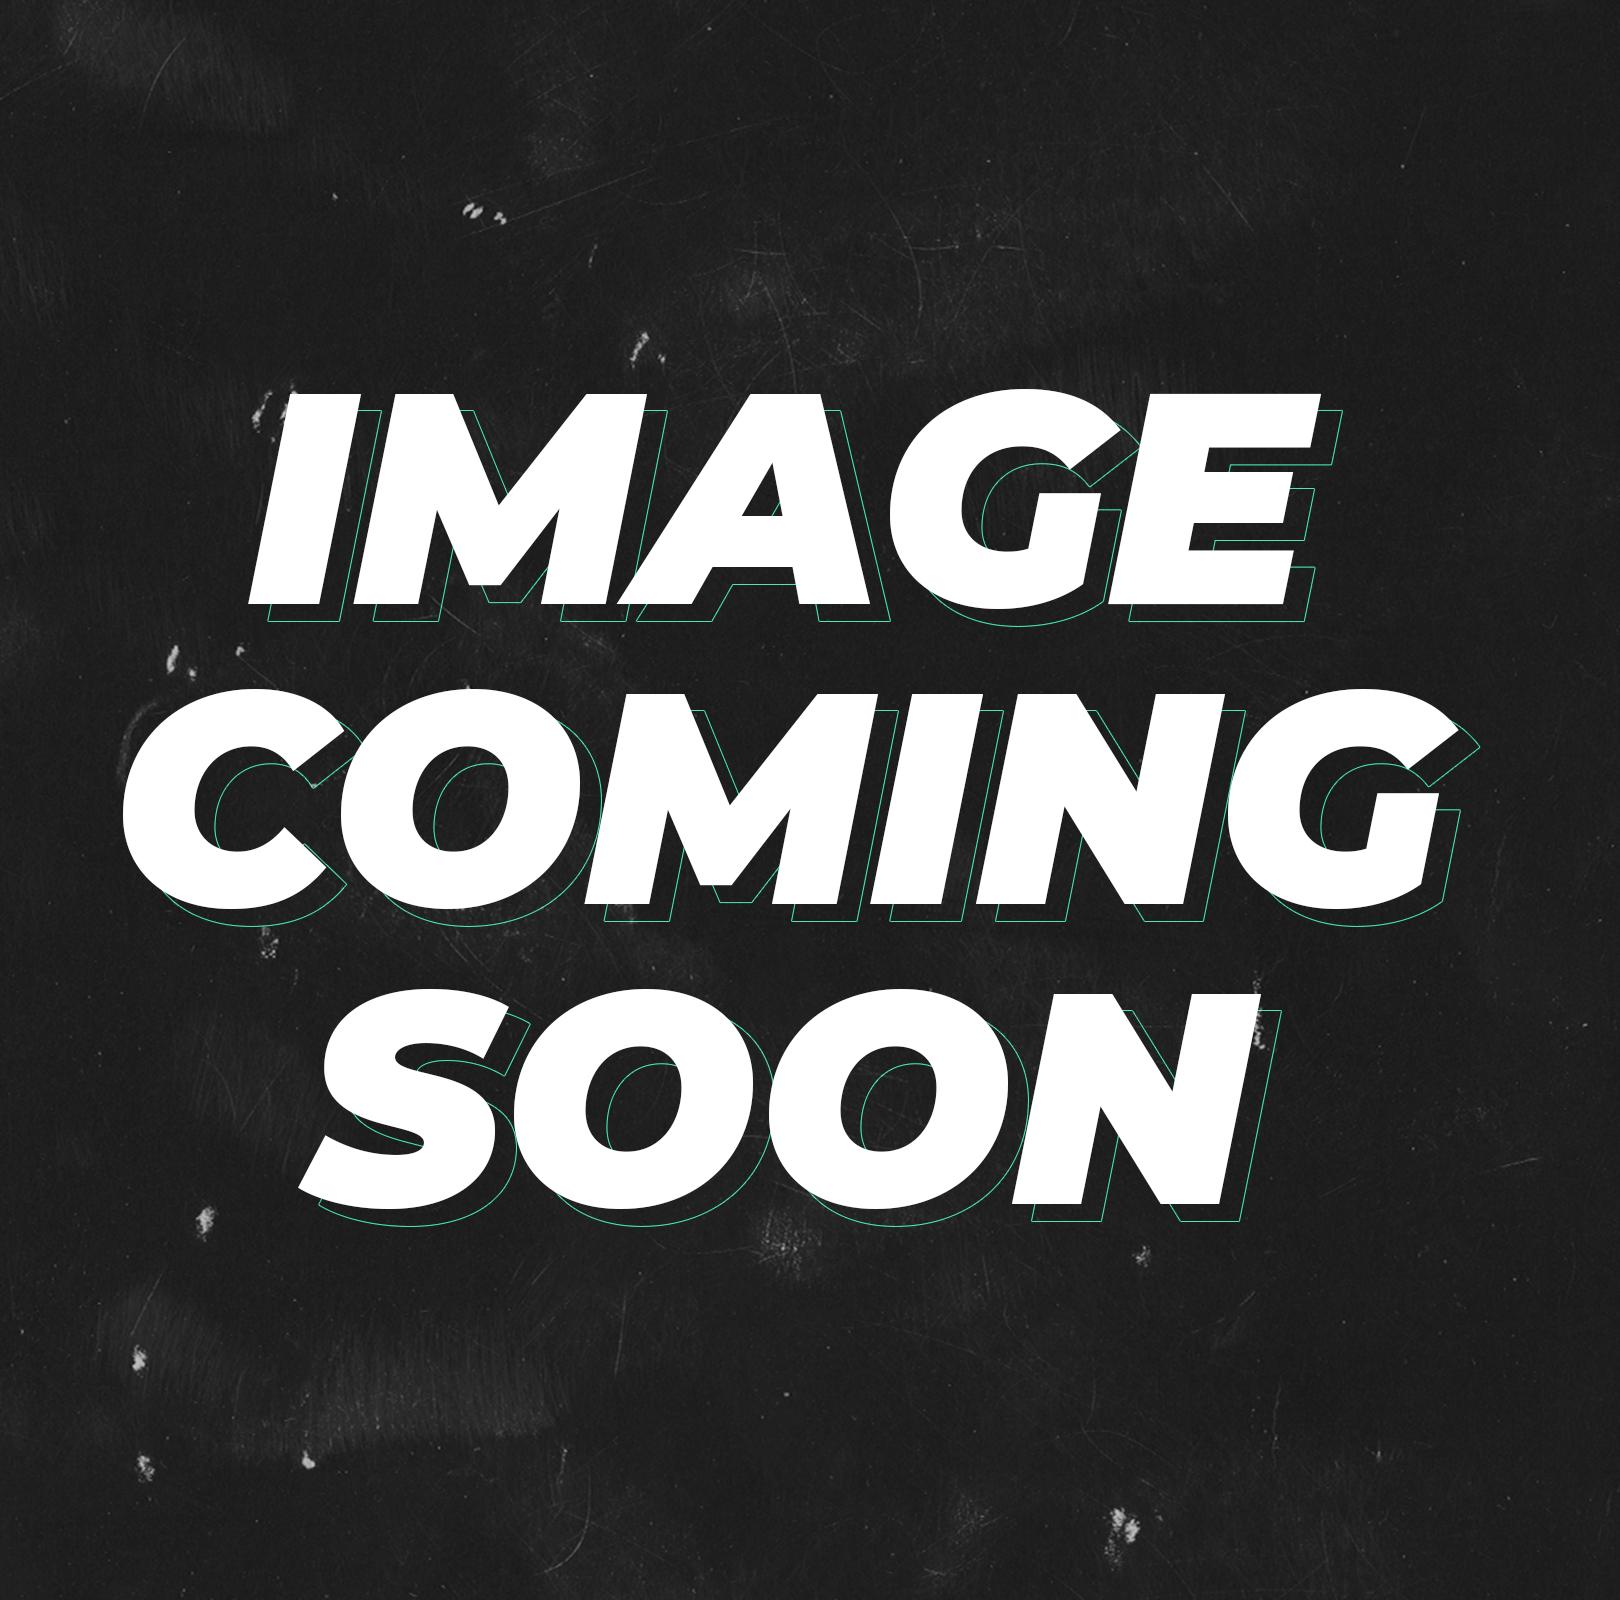 12N5.5A-3B - Atom Wet-Cell Motorcycle Battery 12V 5.5Ah